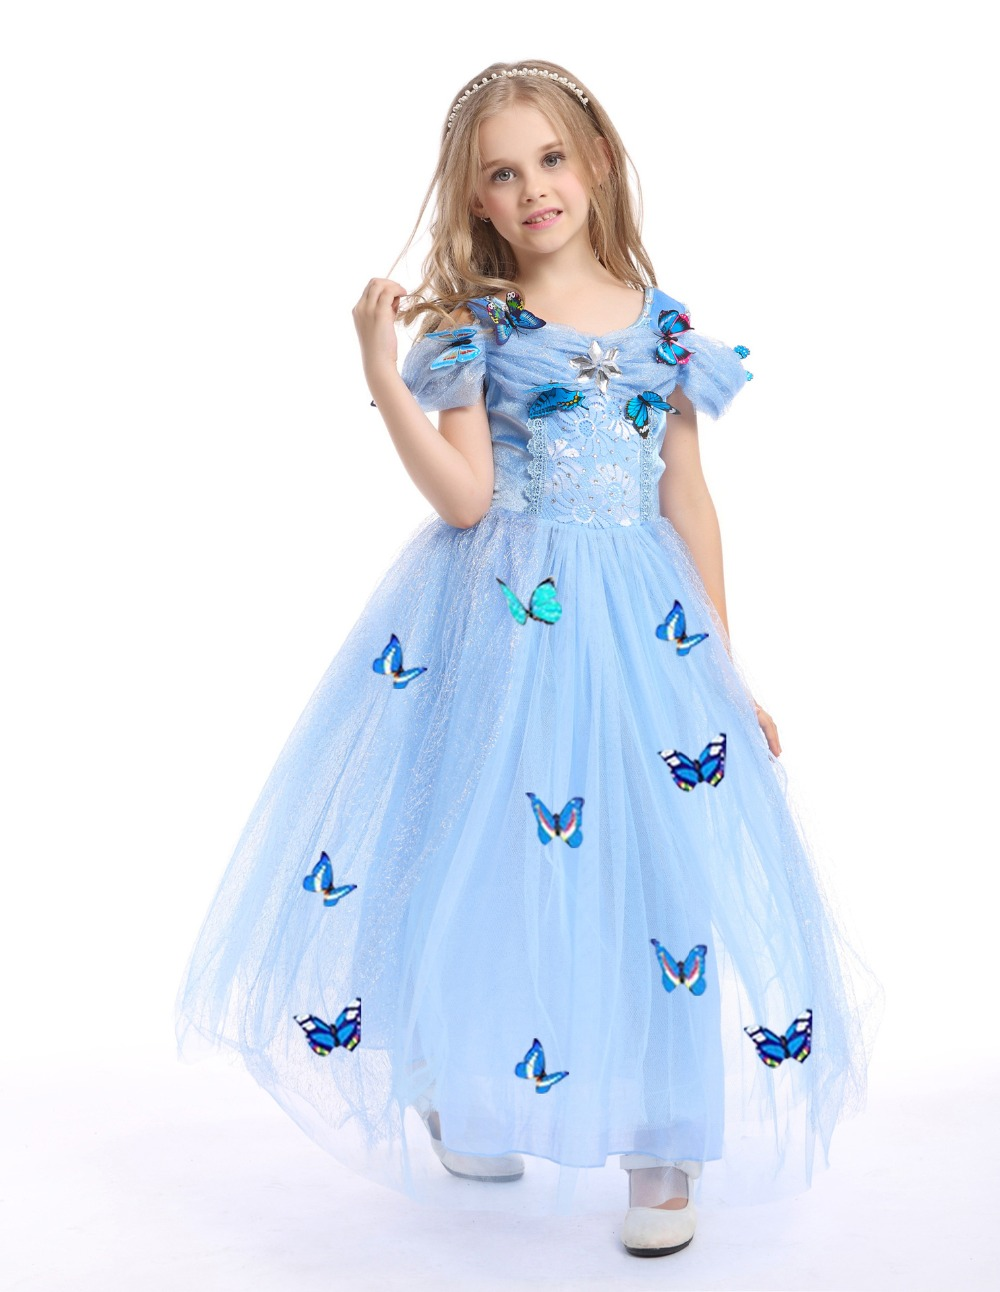 c4daf7c7d4c10 US $15.81 |Girls Party Dresses Ruffle Vintage Vestido Elsa Anna Long Dress  Sophia Princess Costume Kids Evening Dresses Girl Maxi Dress-in Dresses ...